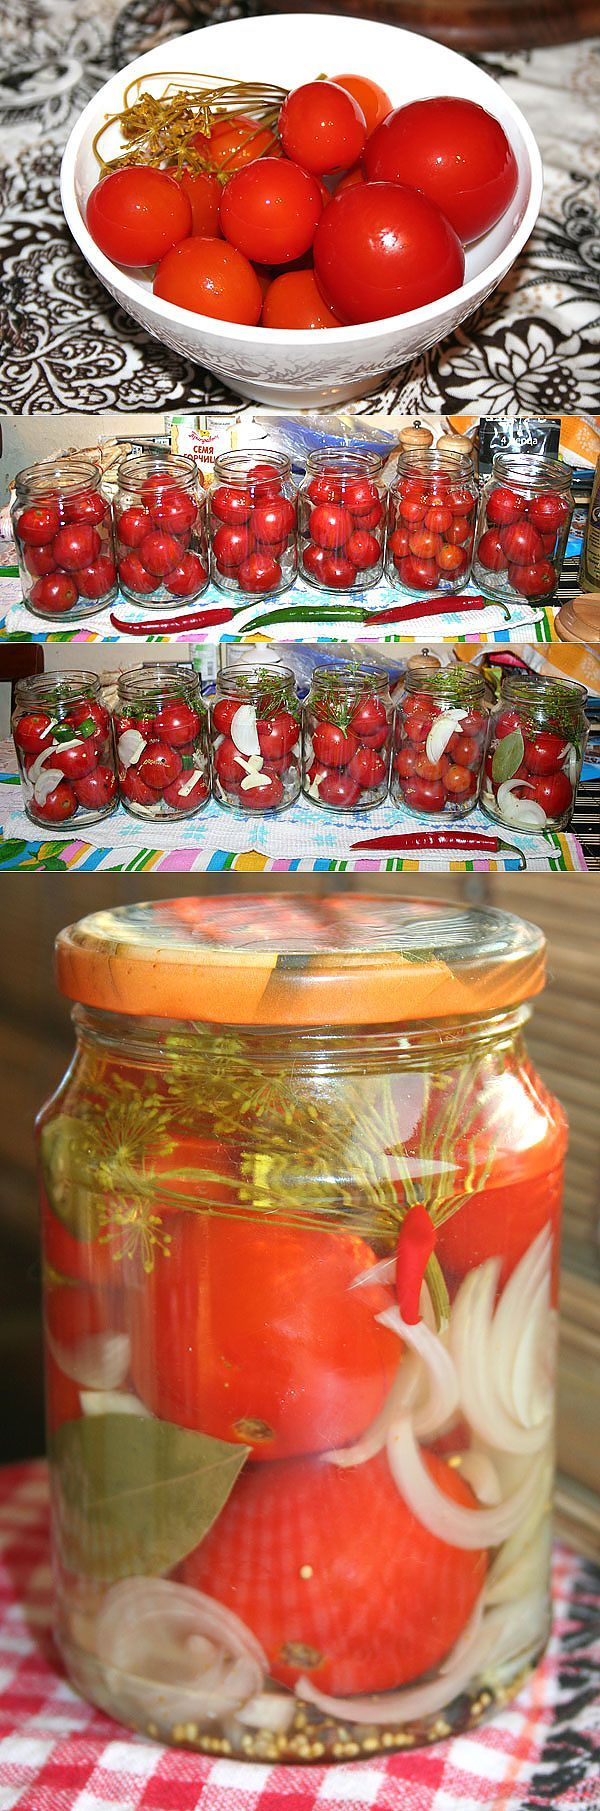 Заготовка помидоры,огурцы